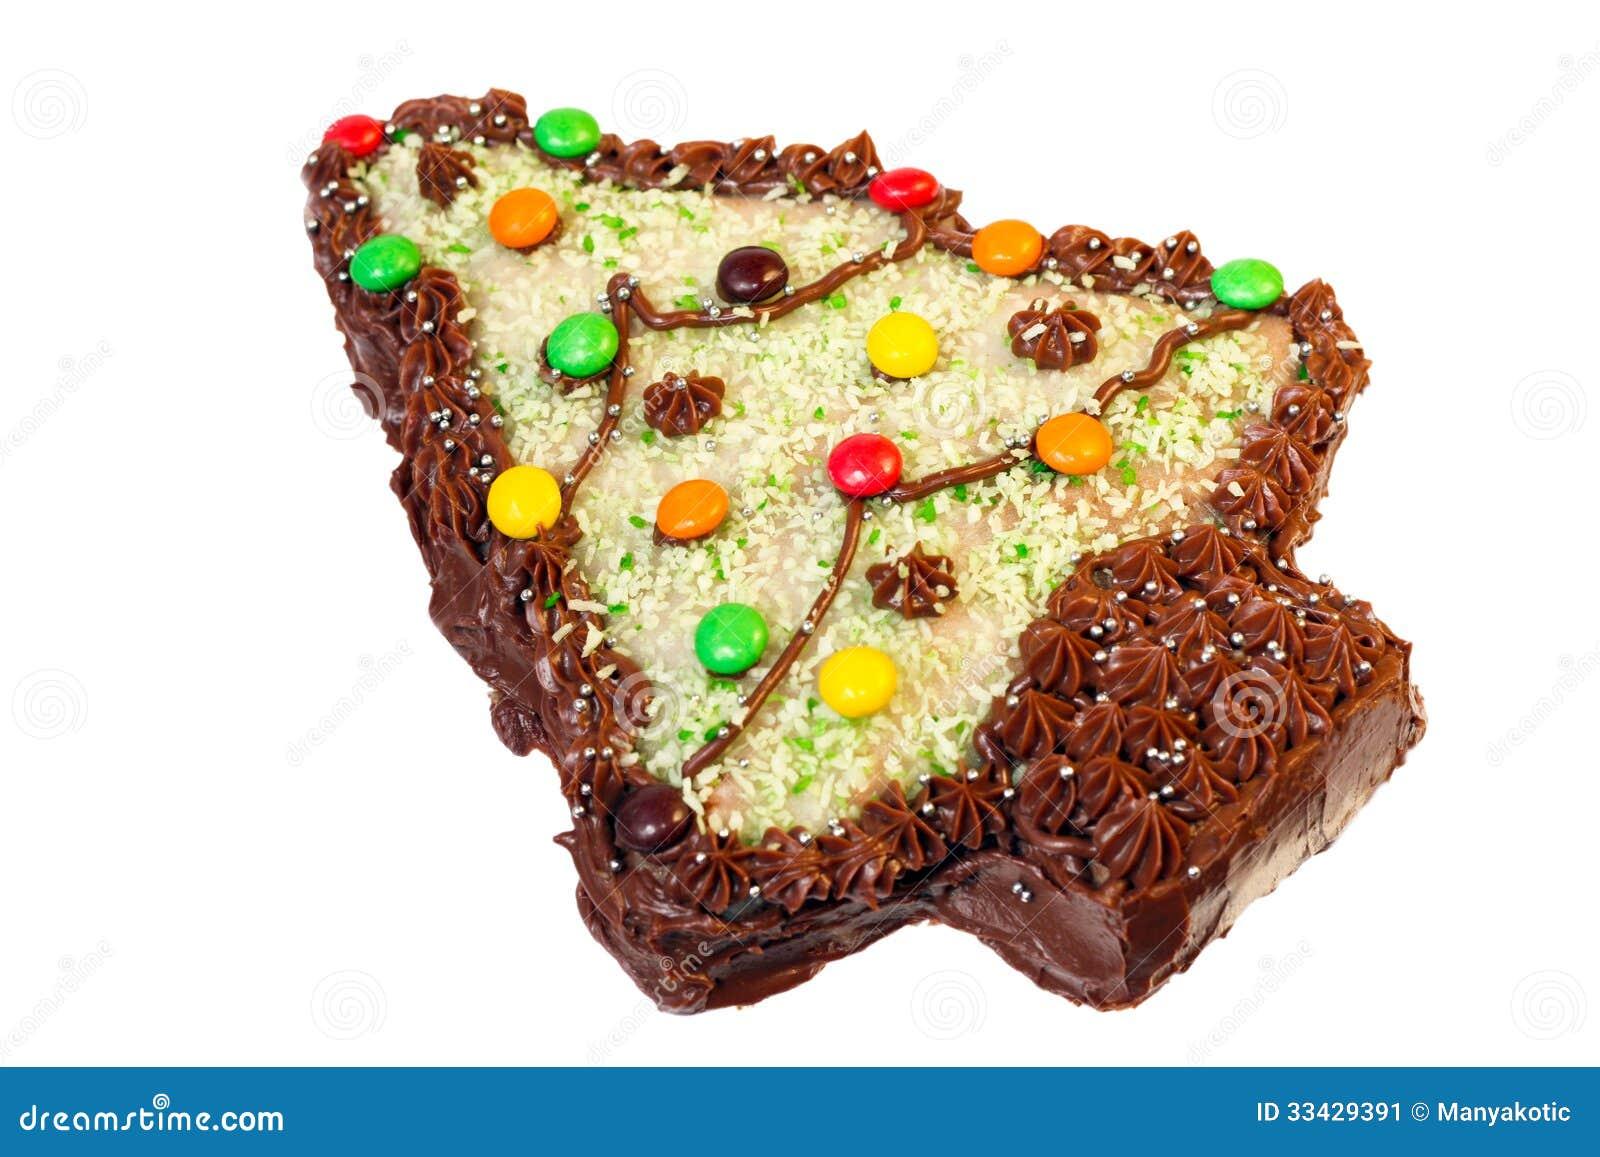 Cake Shaped And Decorated Like Christmas Tree Stock Image ...